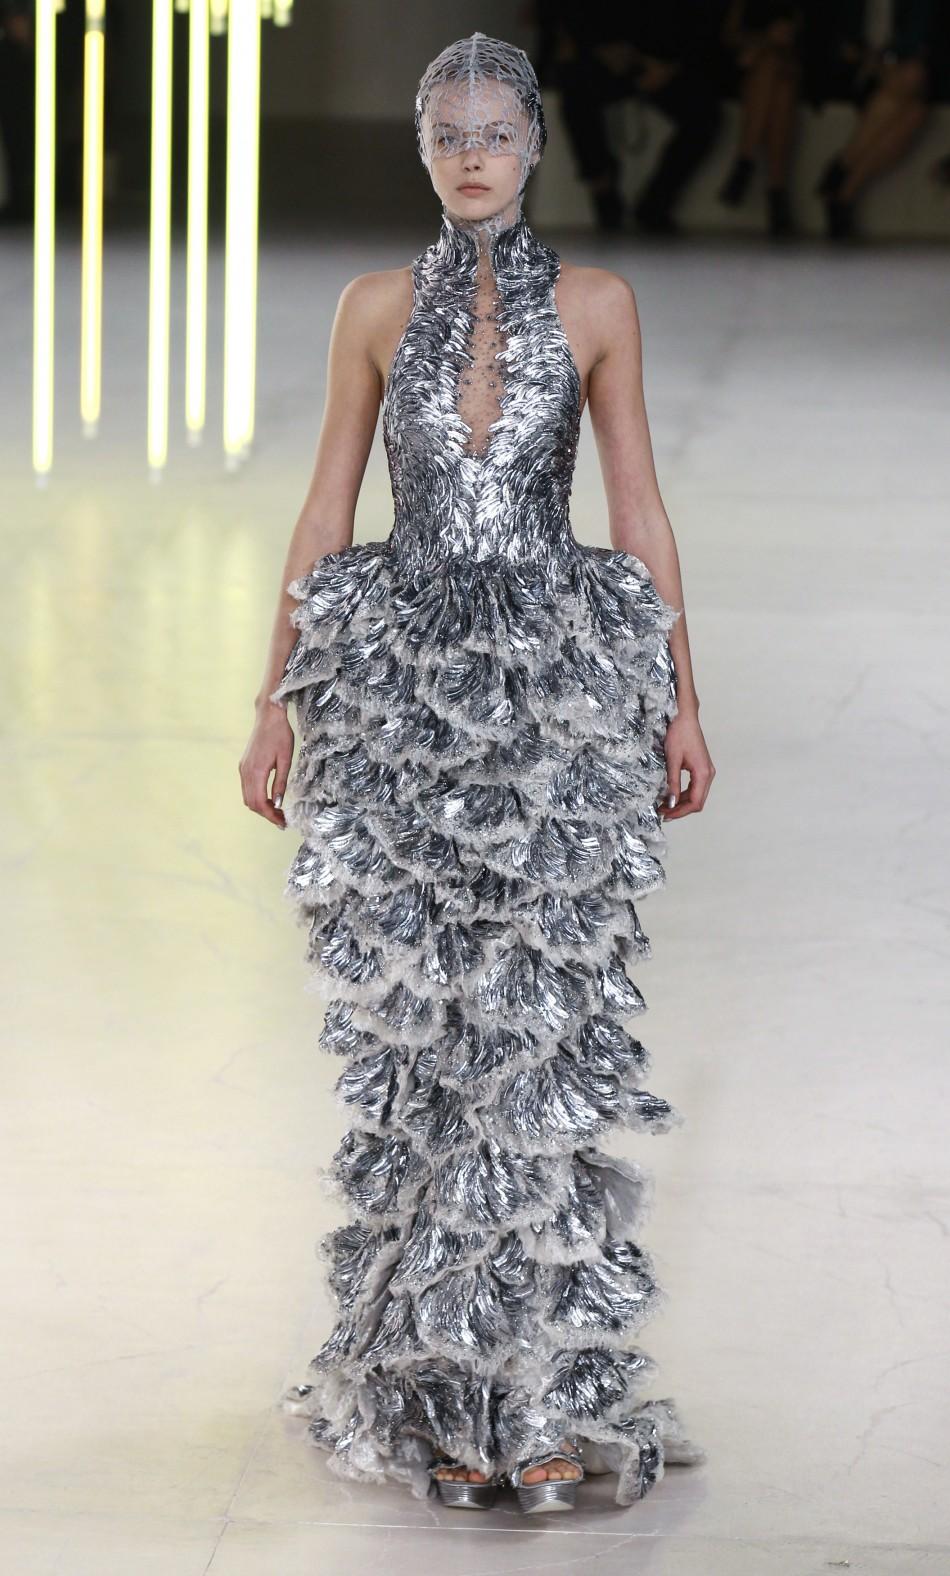 Fashion Designer Carrers